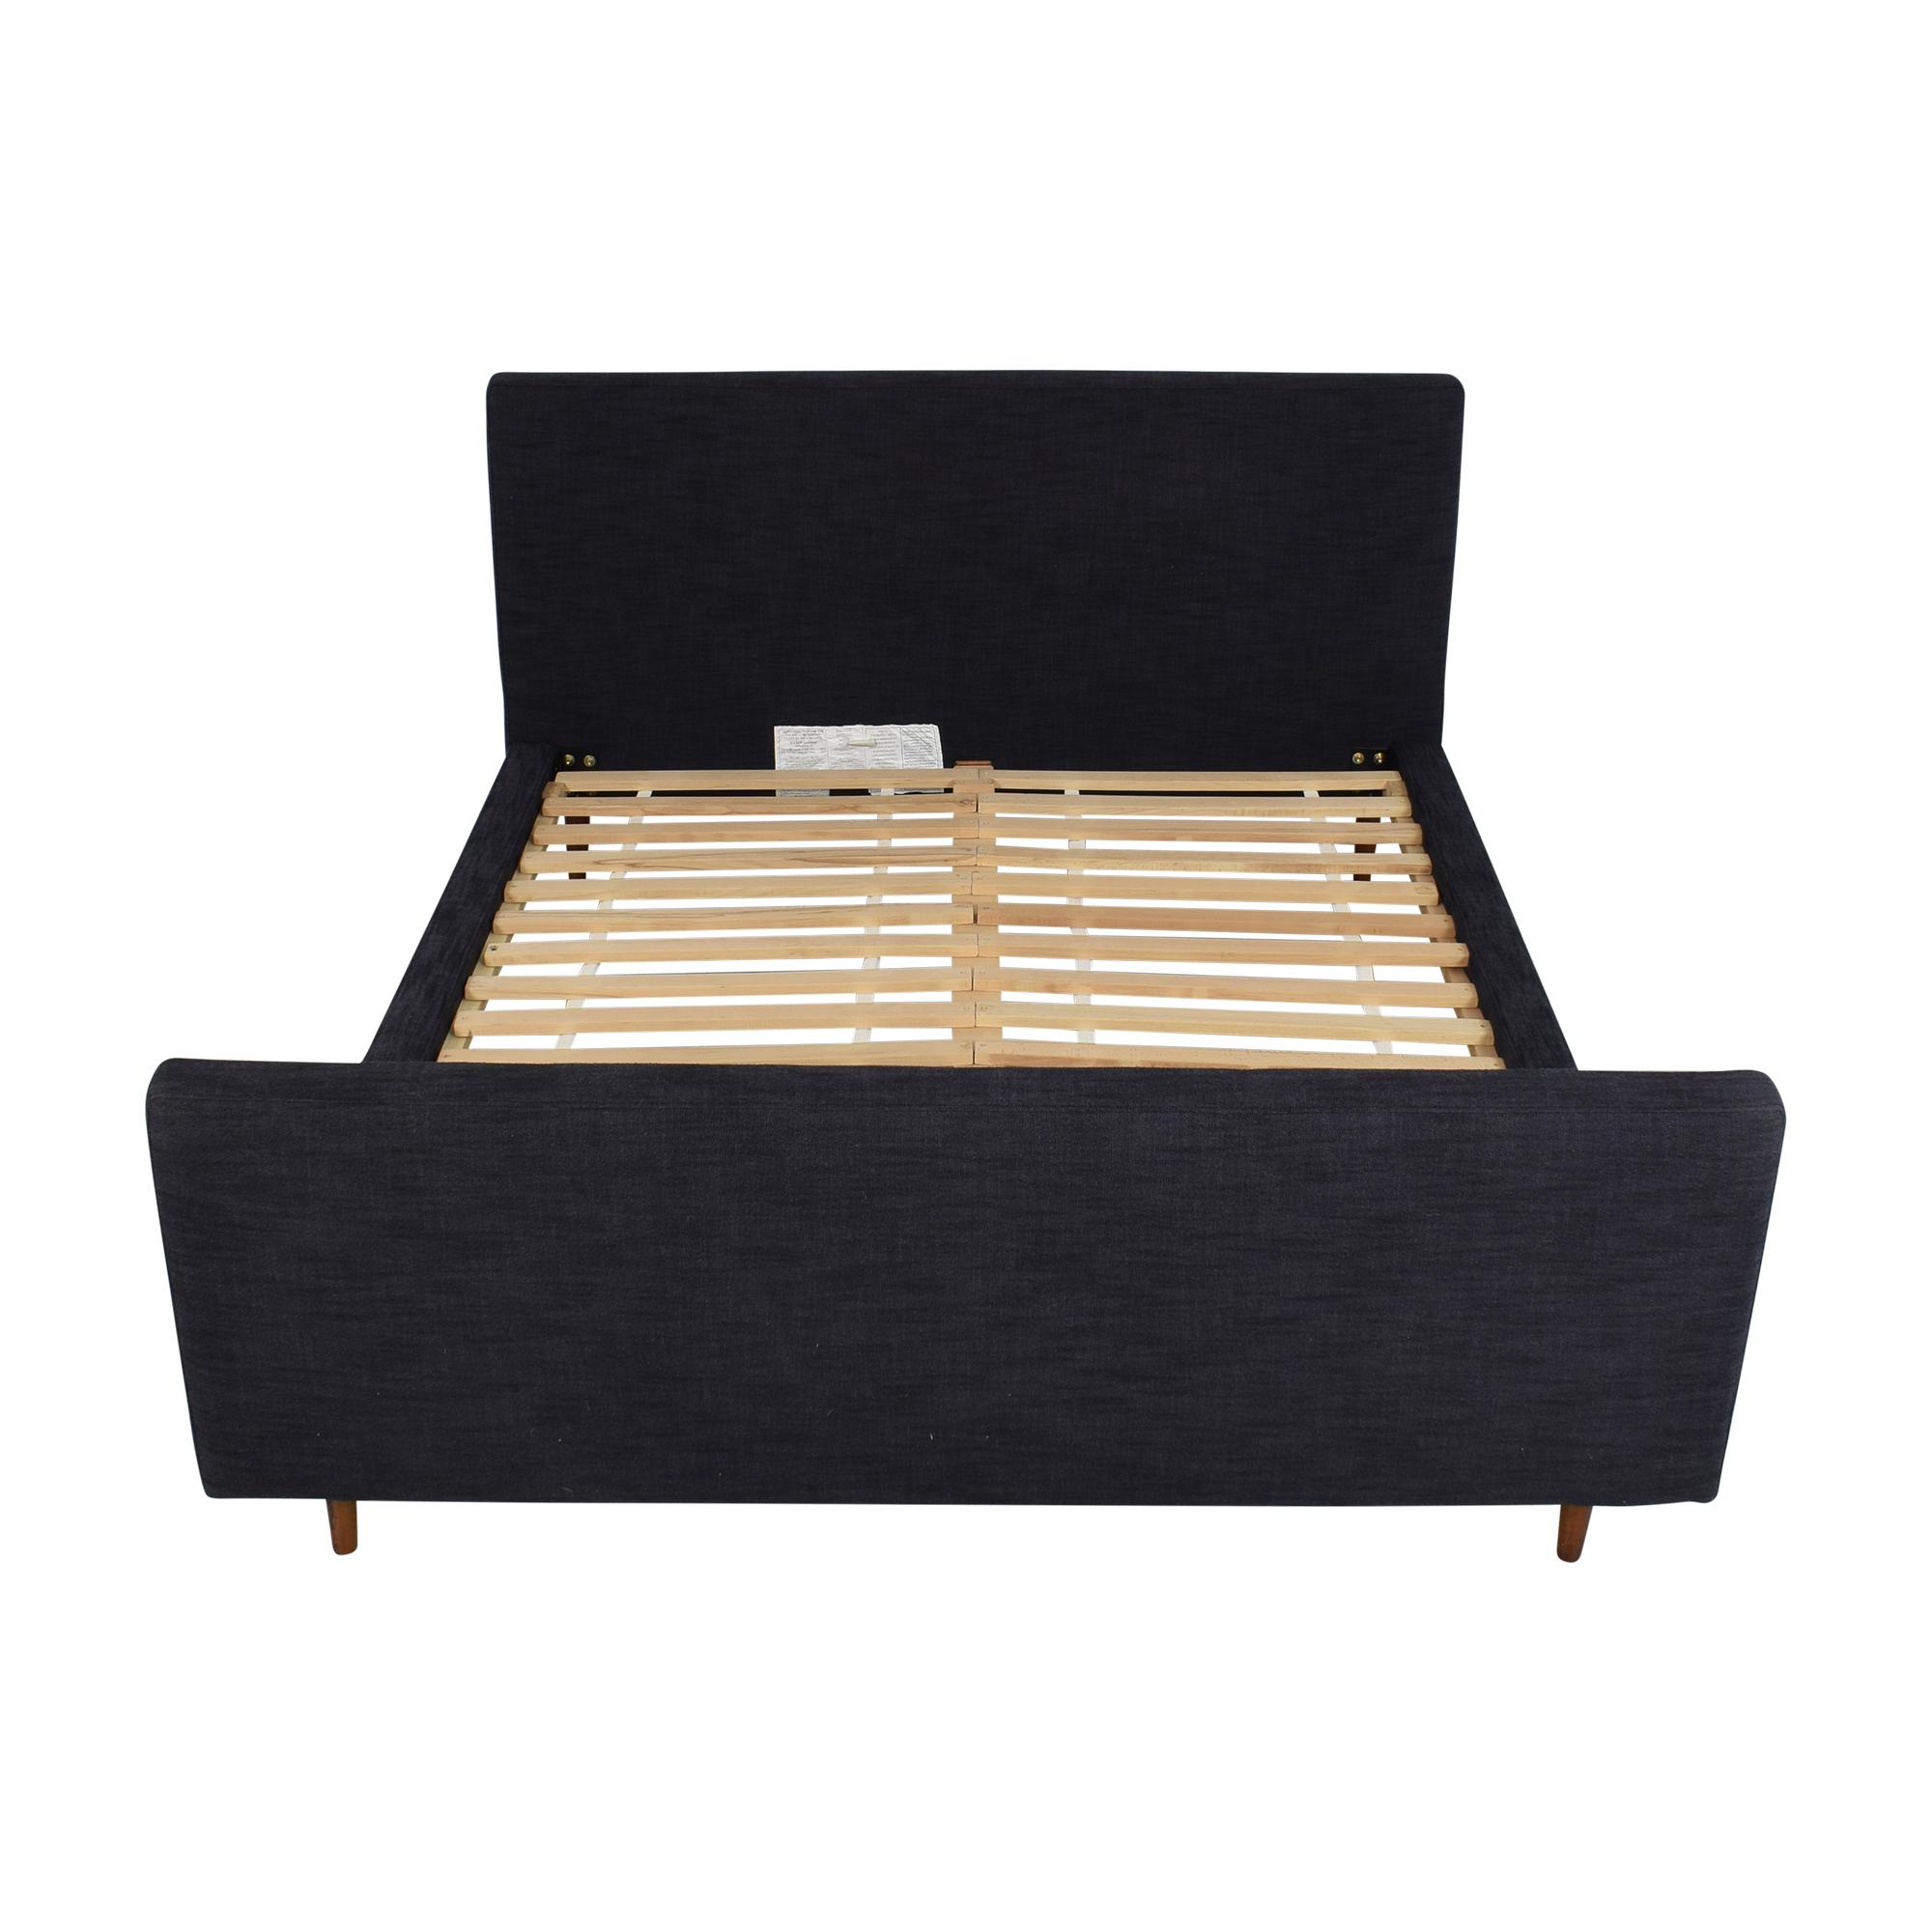 buy West Elm Queen Upholstered Bed with Footboard West Elm Beds